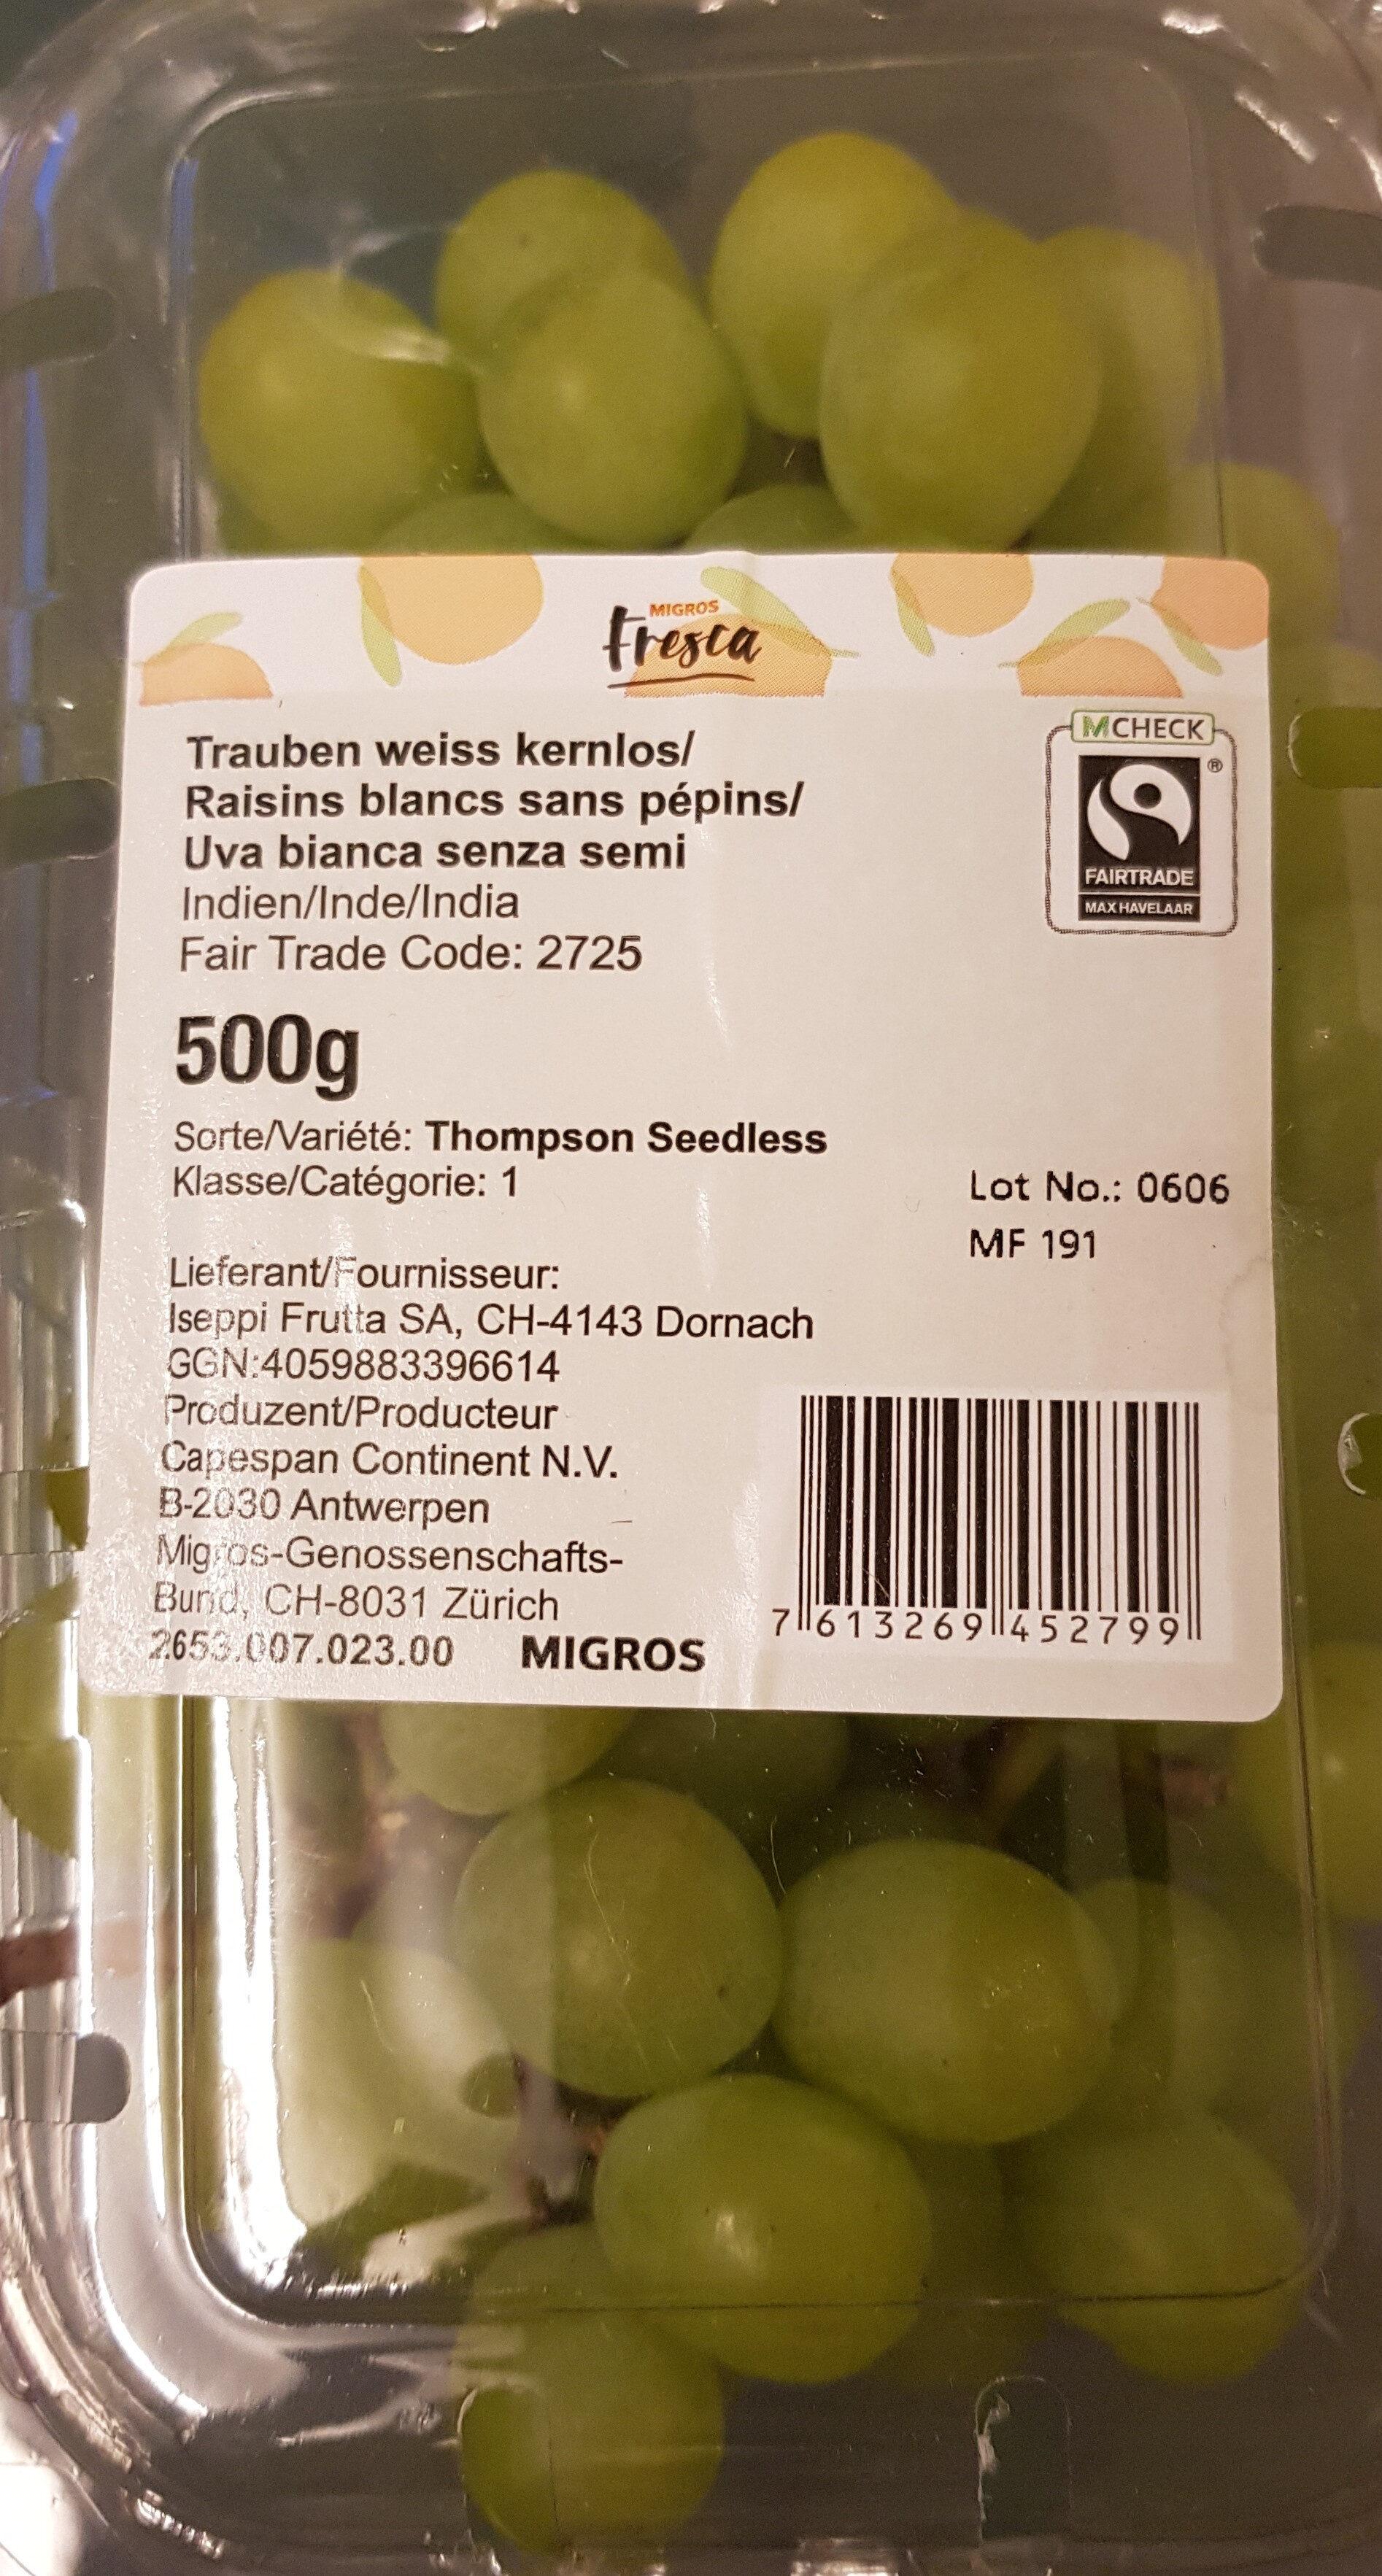 Trauben weiss kernlos - Product